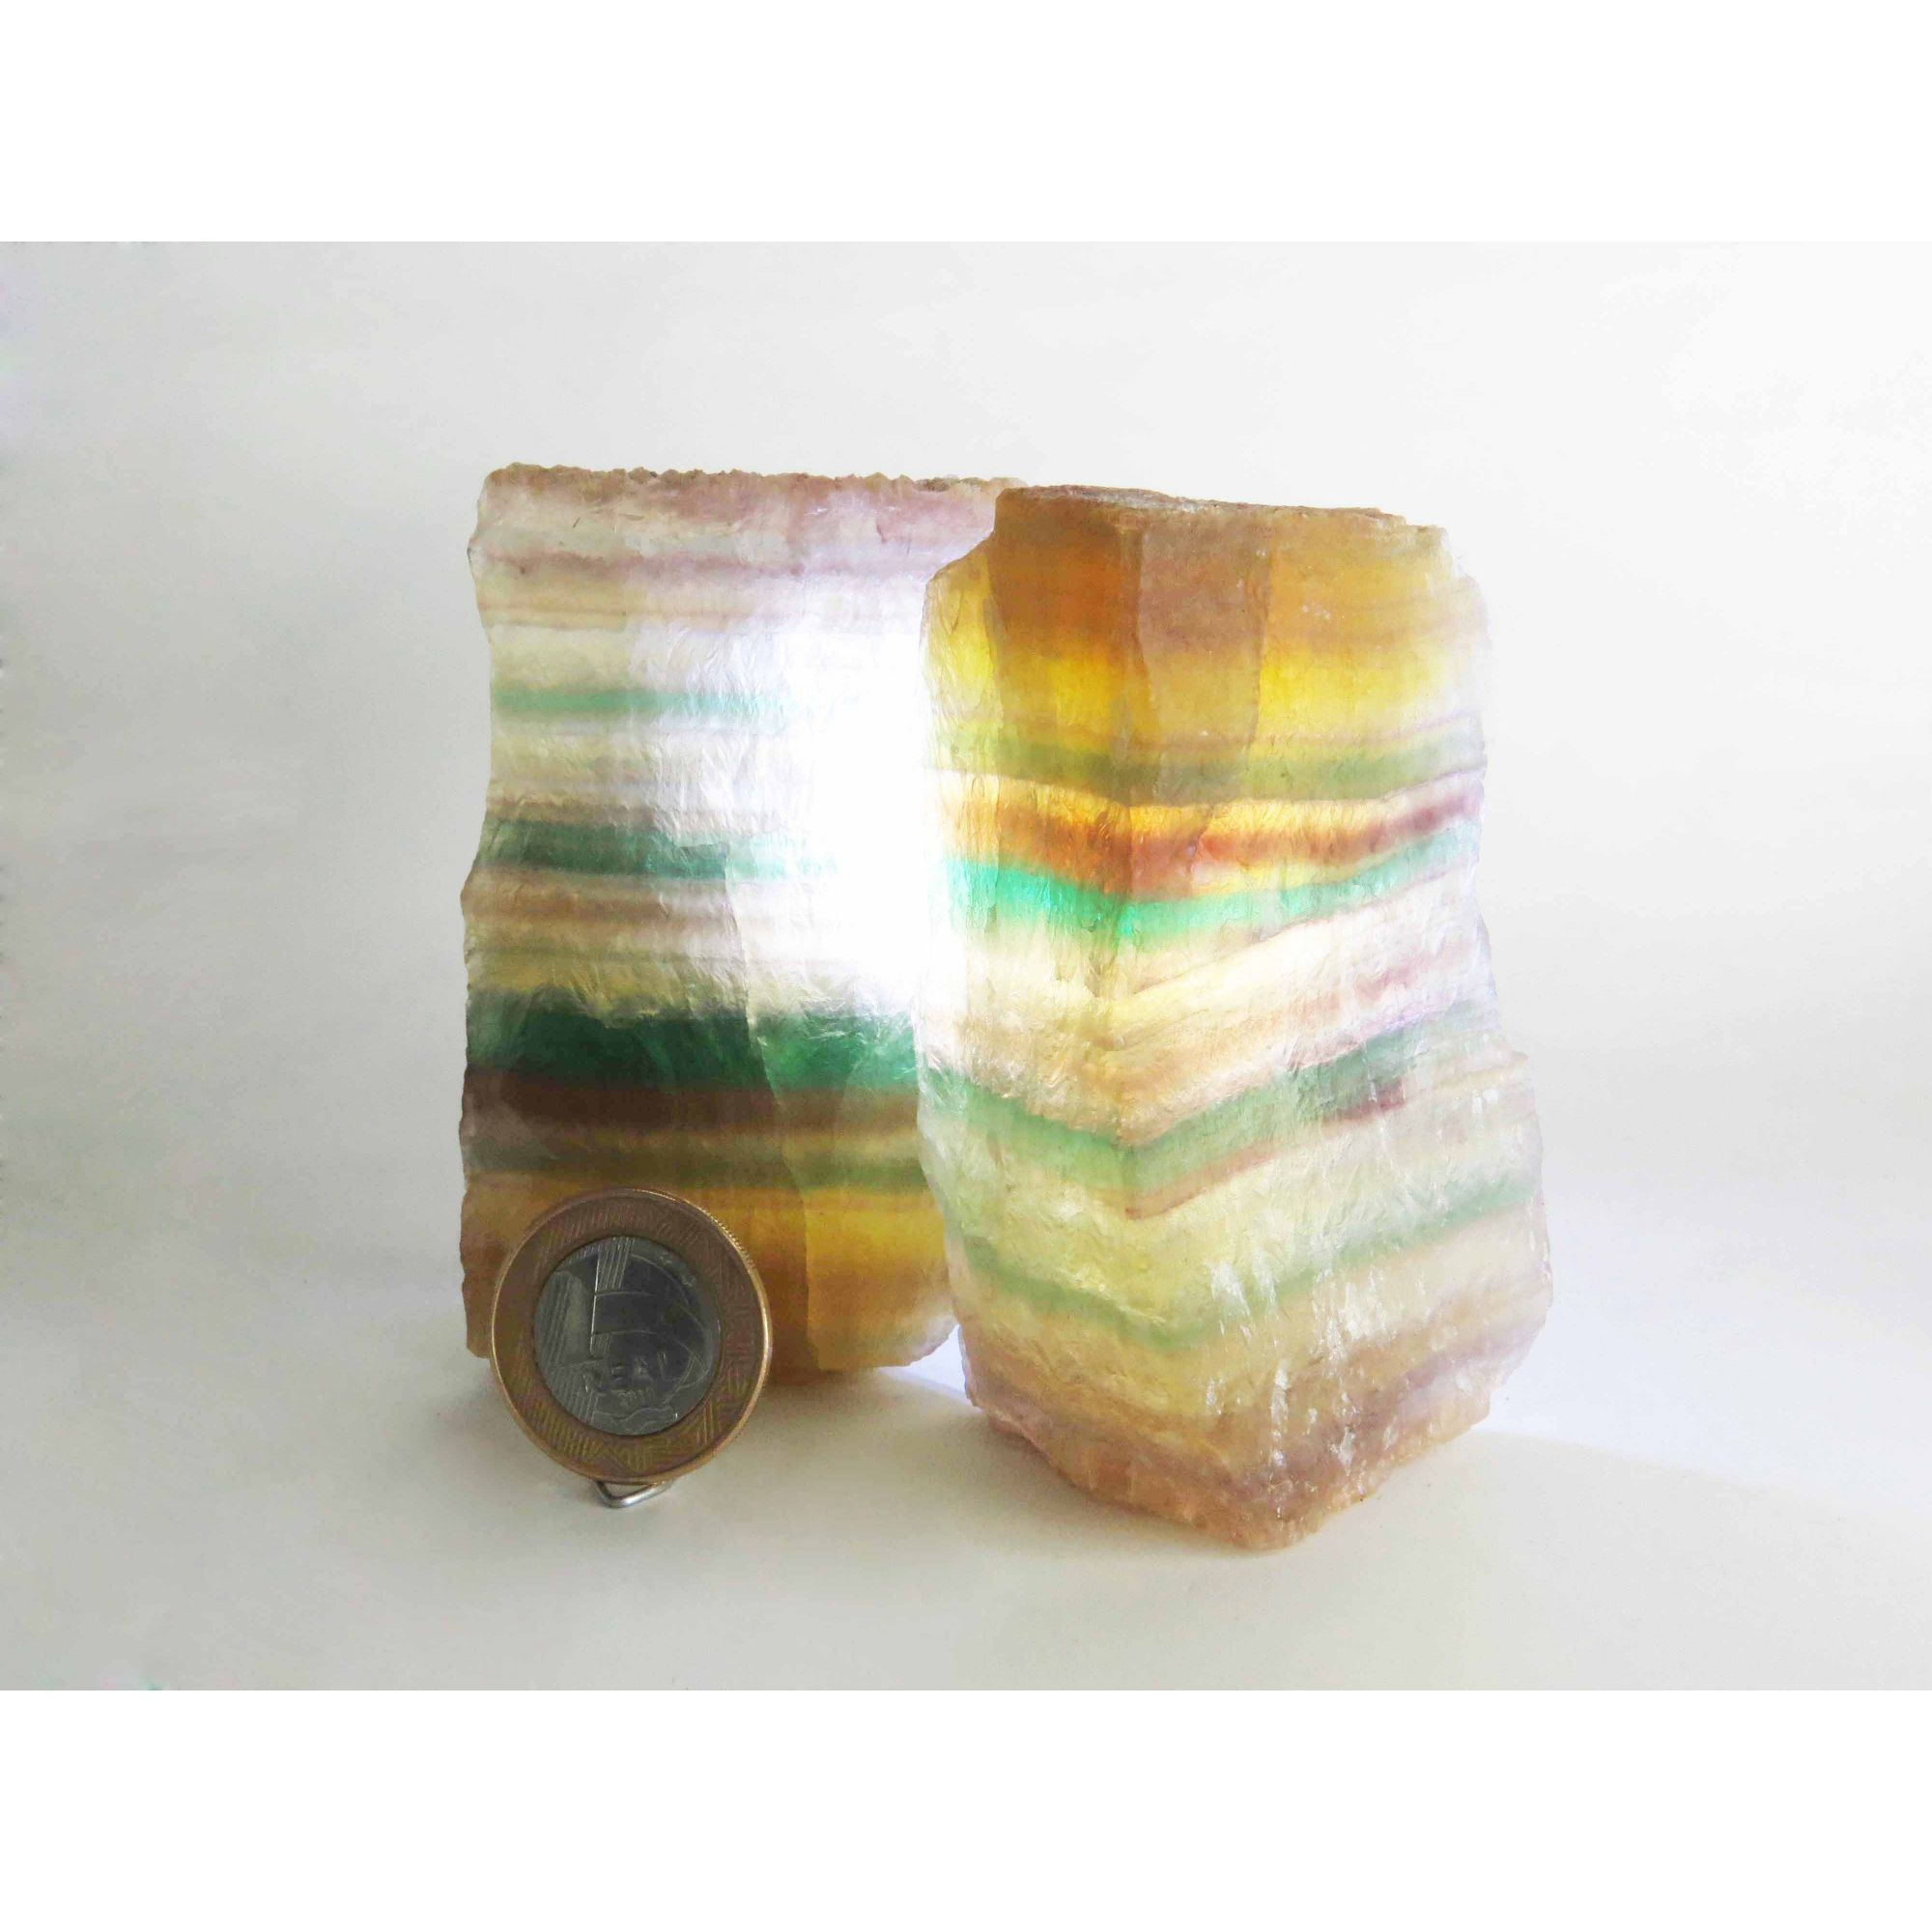 Fluorita Arco-Íris - Bruto - 2,5 a 4 cm